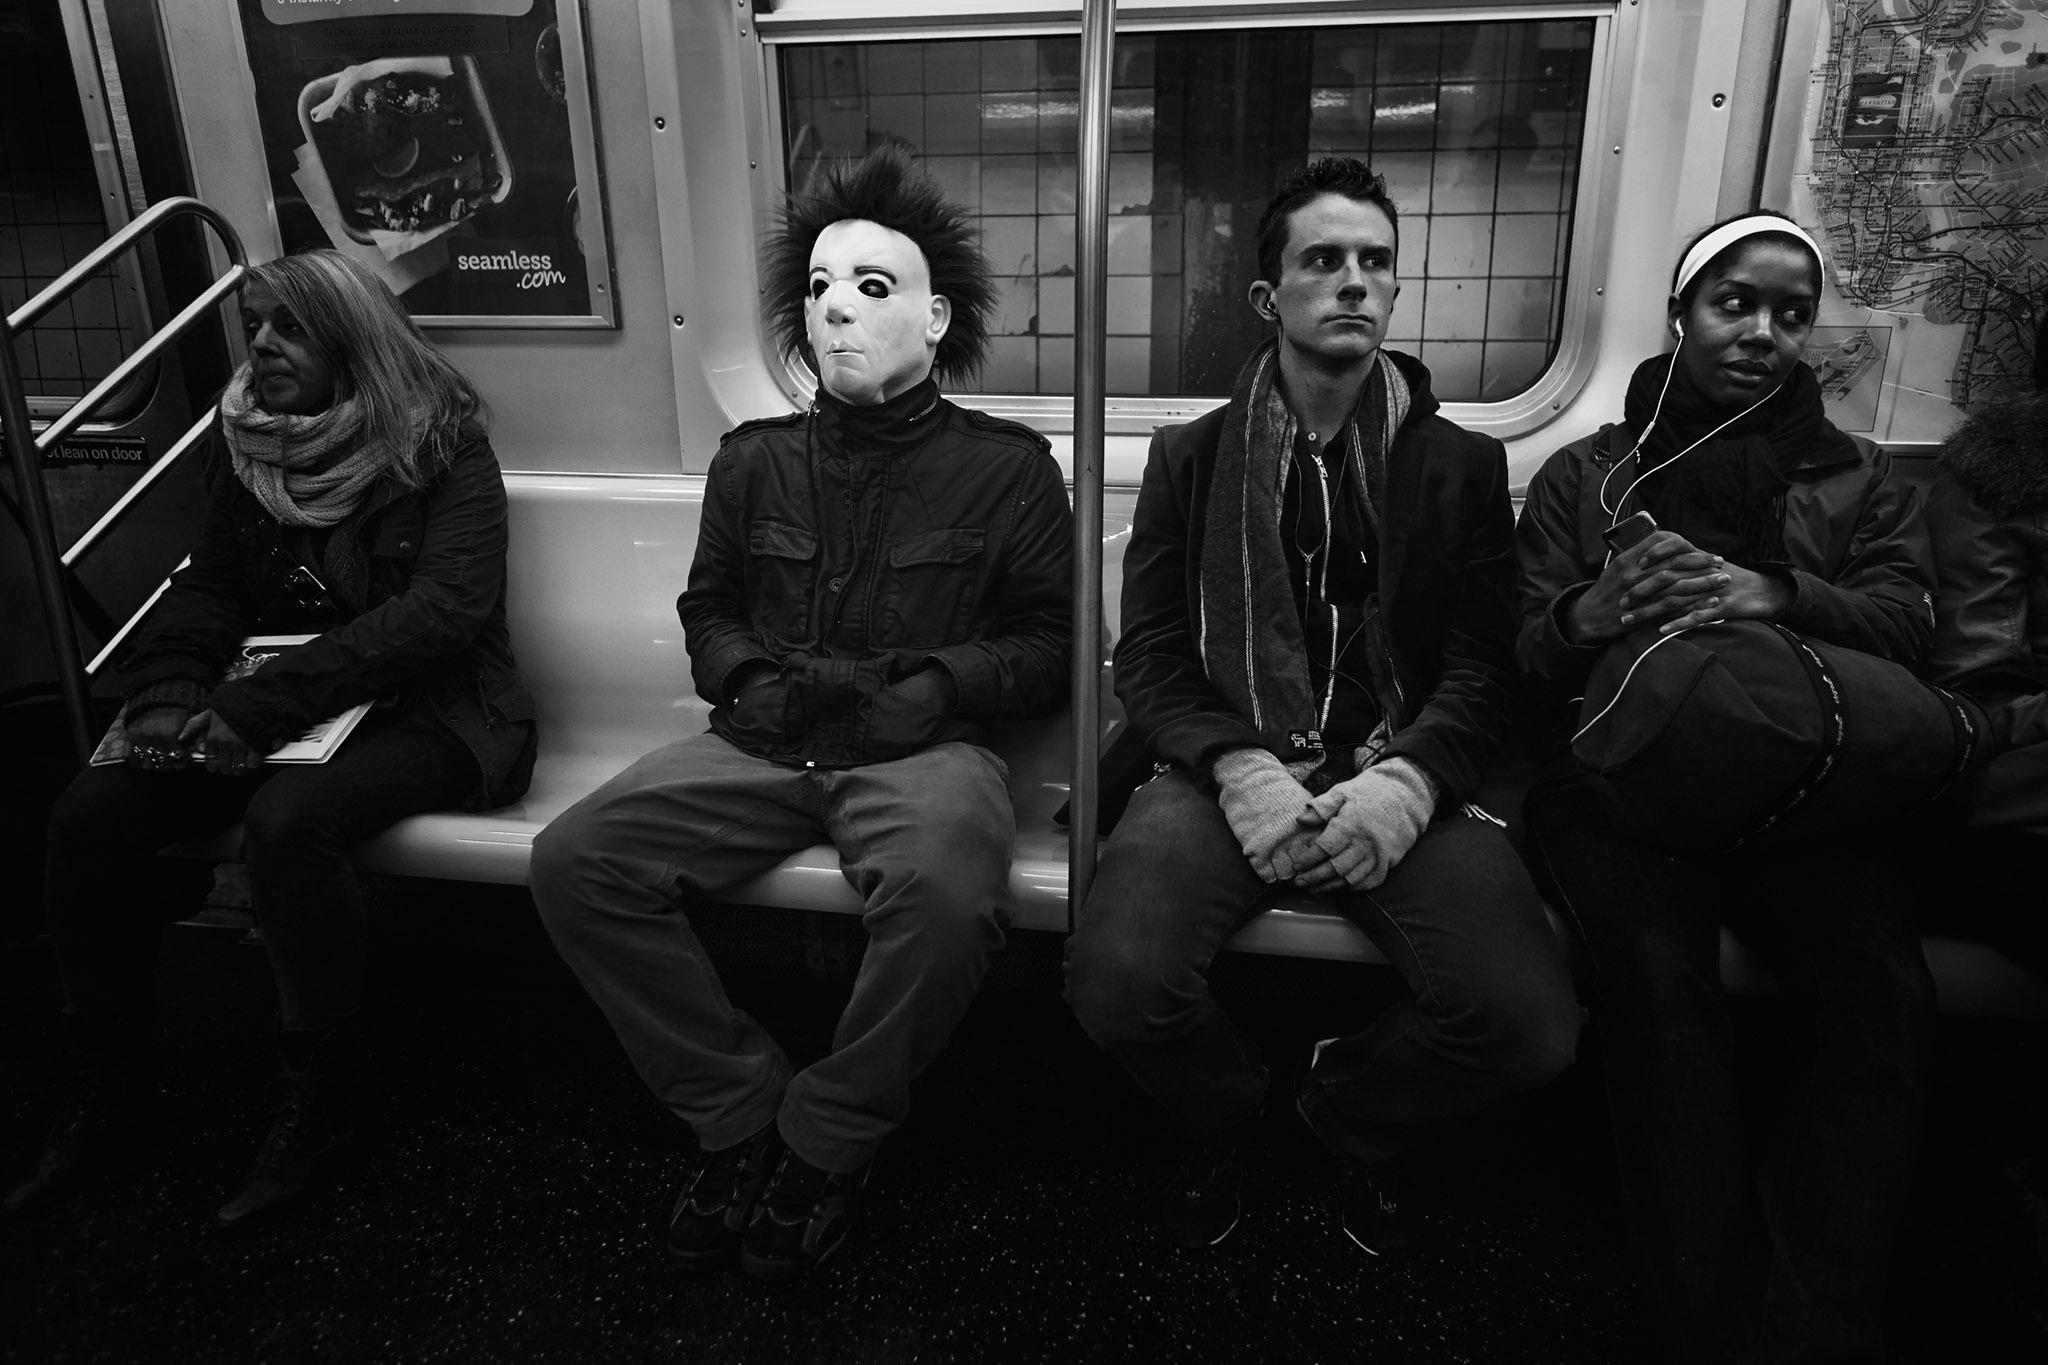 7:18pm October 31st, 2011 - Bushwick, Brooklyn